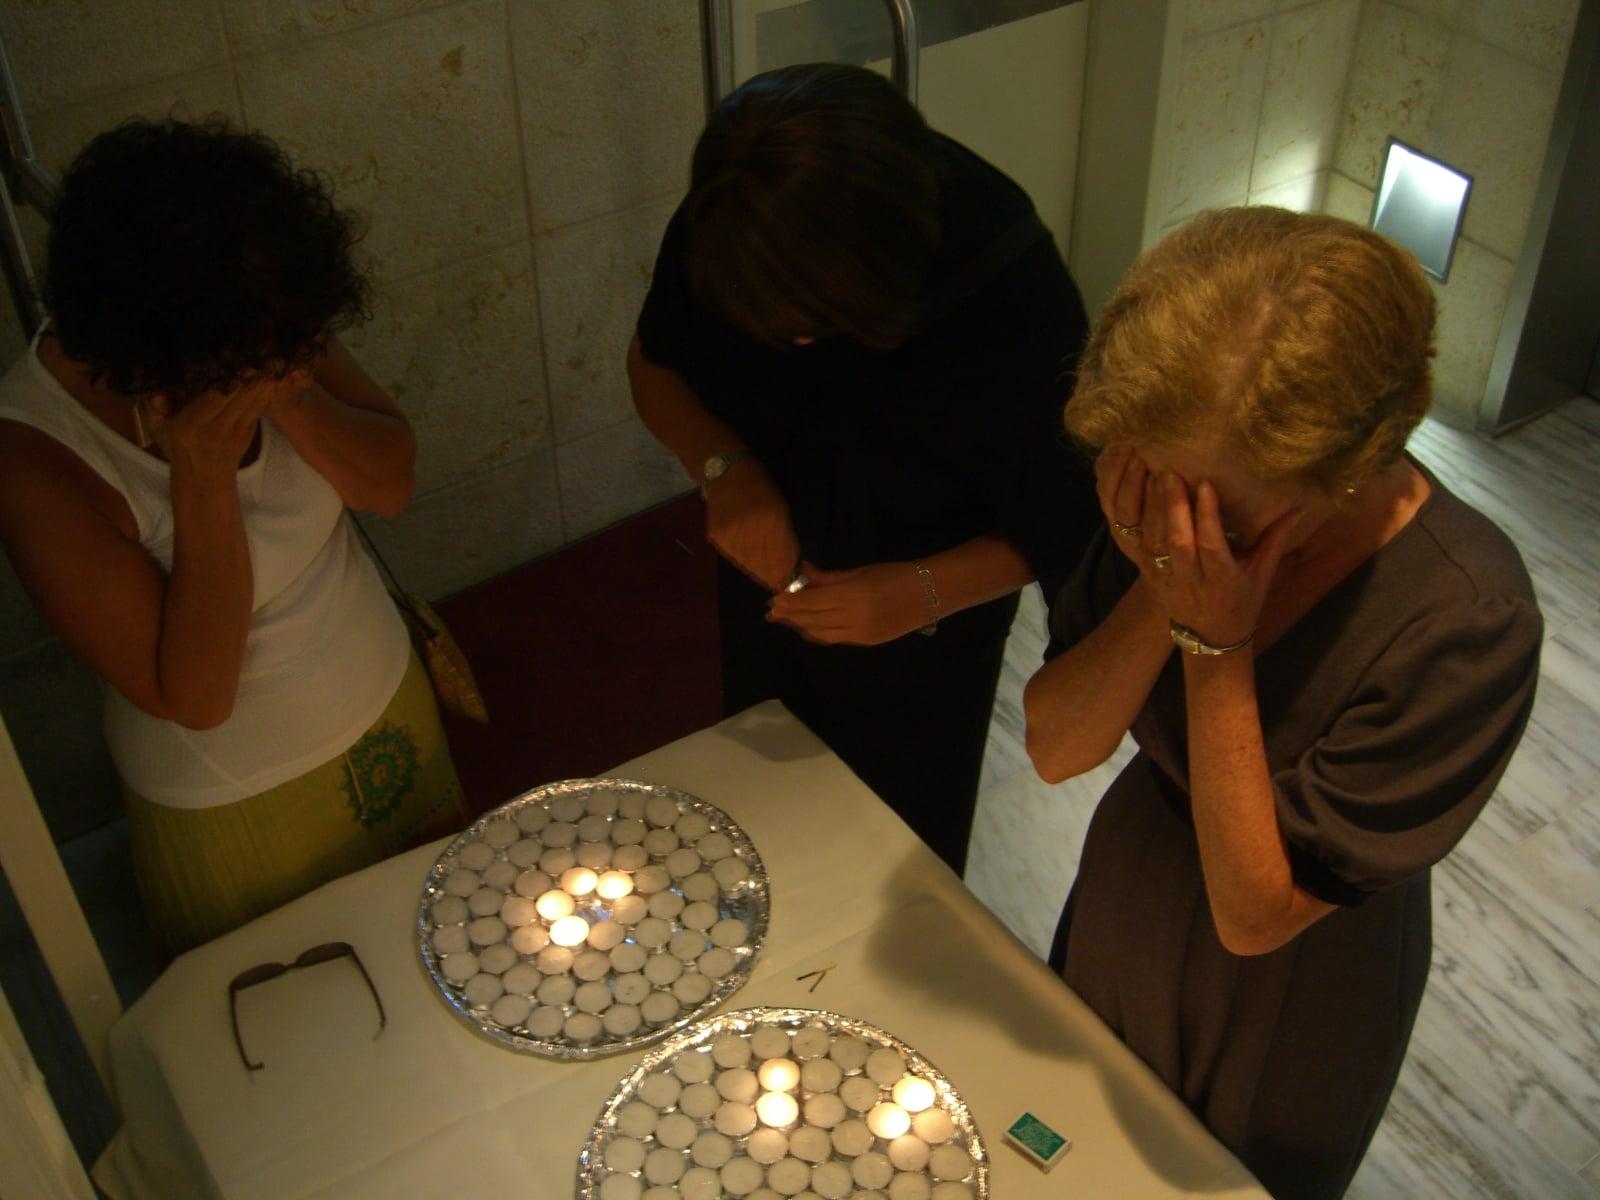 candle-lightting-in-israel_8456606622_o.jpg